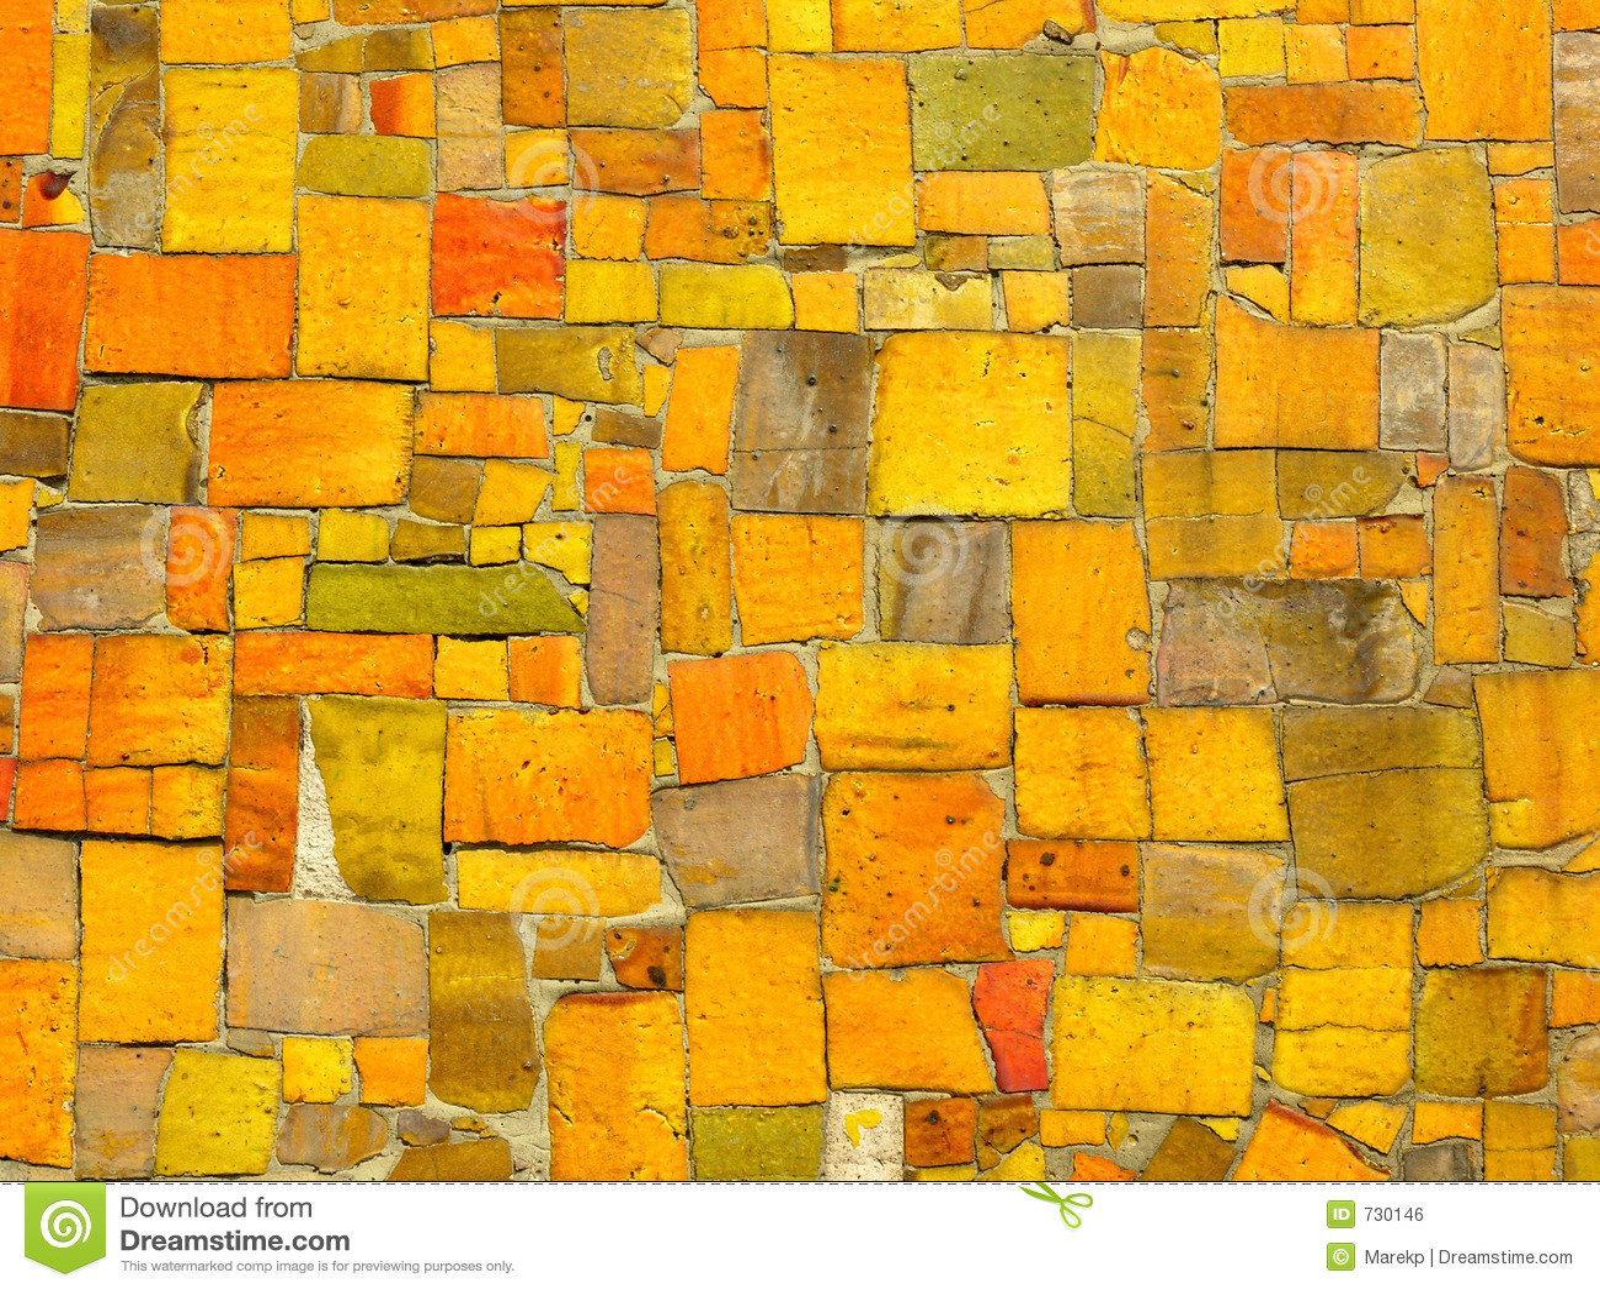 Yellow Tiles Mosaic Random Pattern Royalty Free Stock